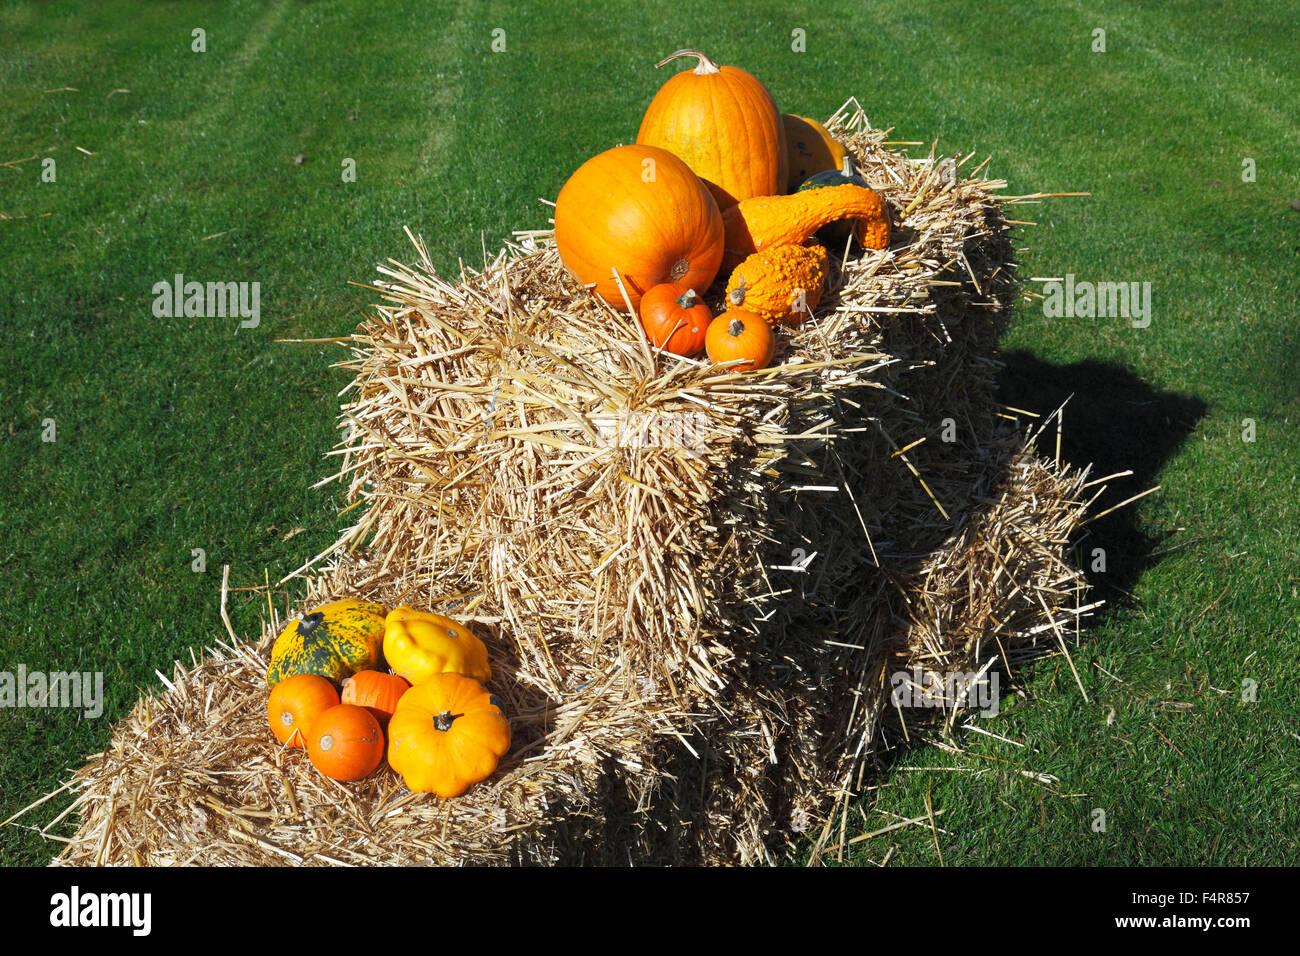 Thanksgiving Day decoration, pumpkins on a straw bale, Cucurbita maxima, Hokkaido Red kuri squash, summer squash, Stock Photo